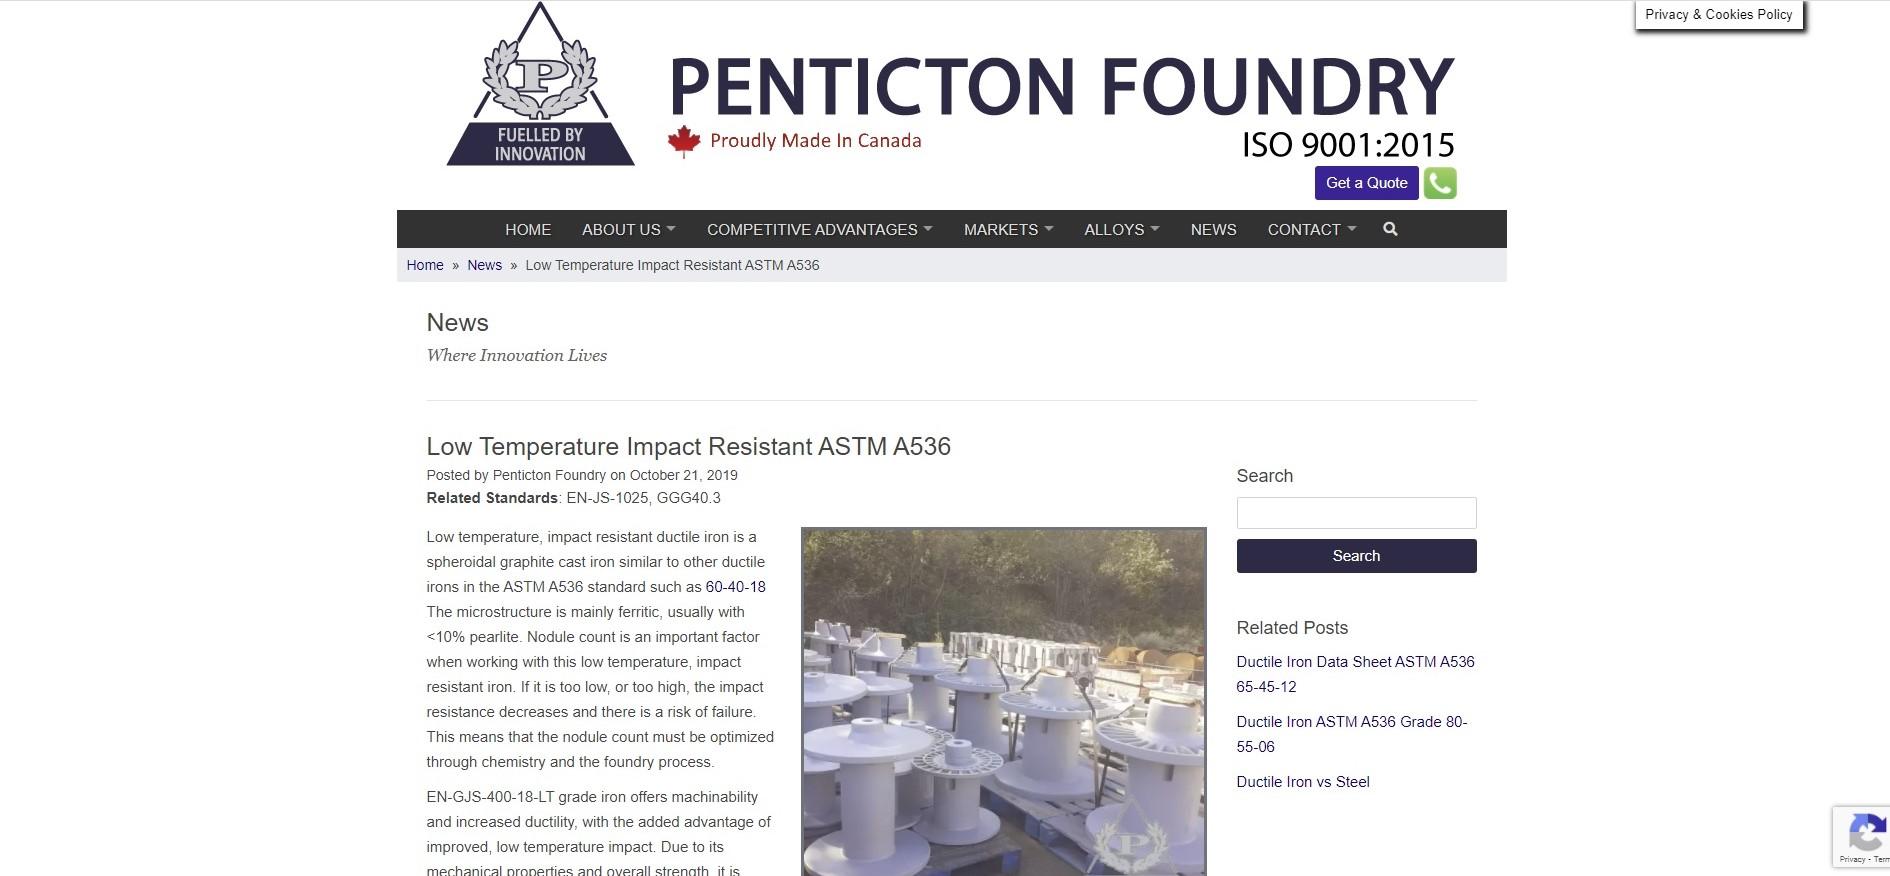 https://www.pentictonfoundry.com/news/low-temperature-impact-resistant-astm-a536/